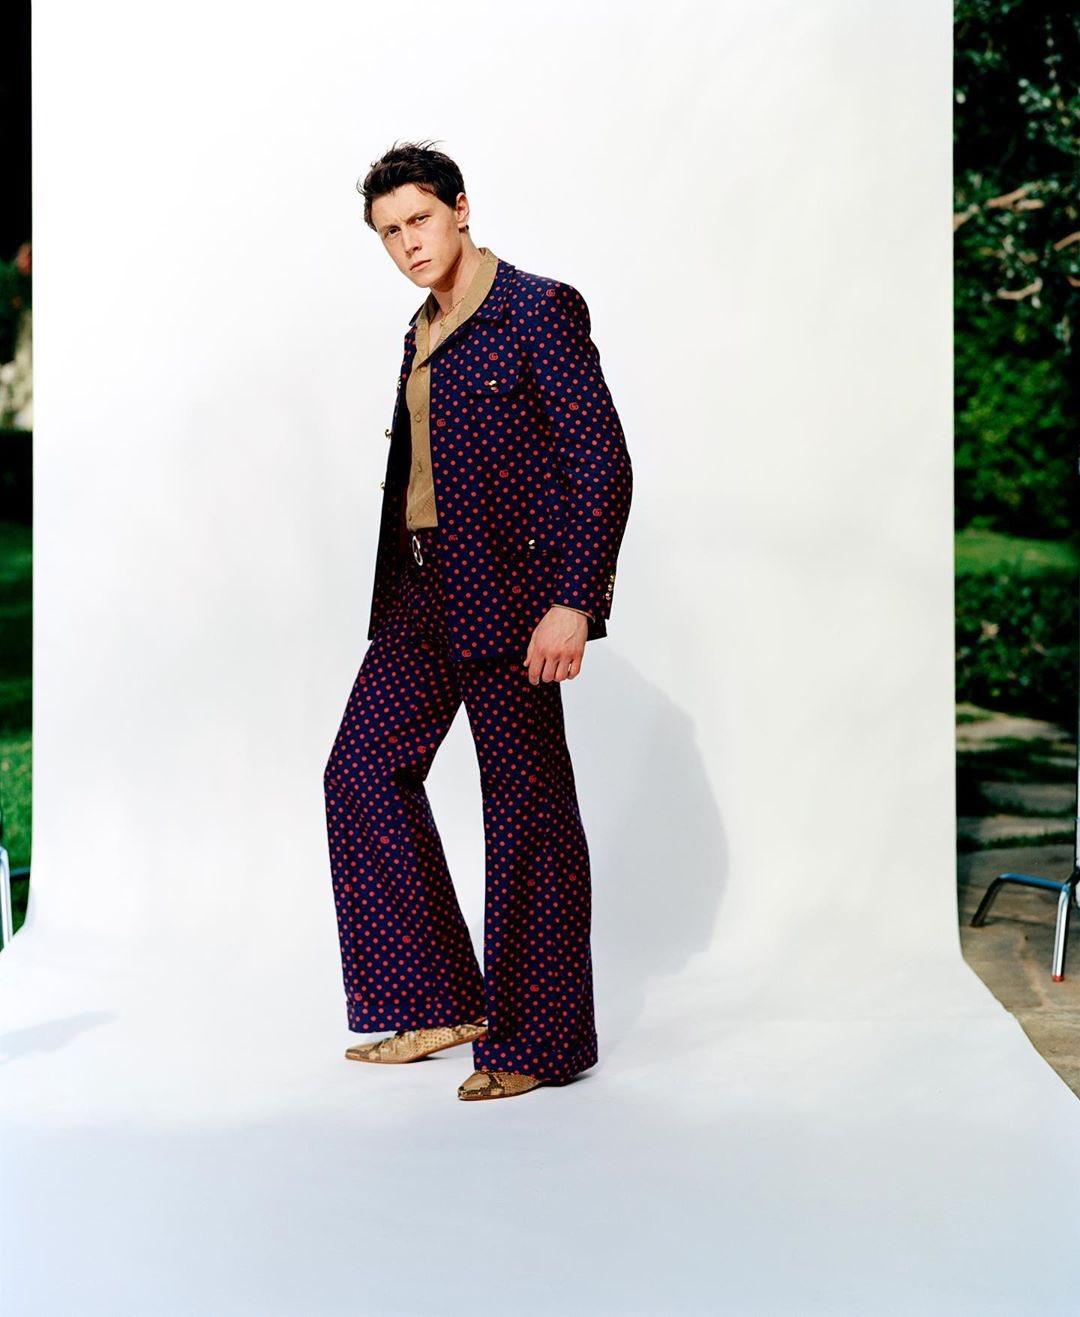 George MacKay - Interview Magazine Photoshoot - 2020